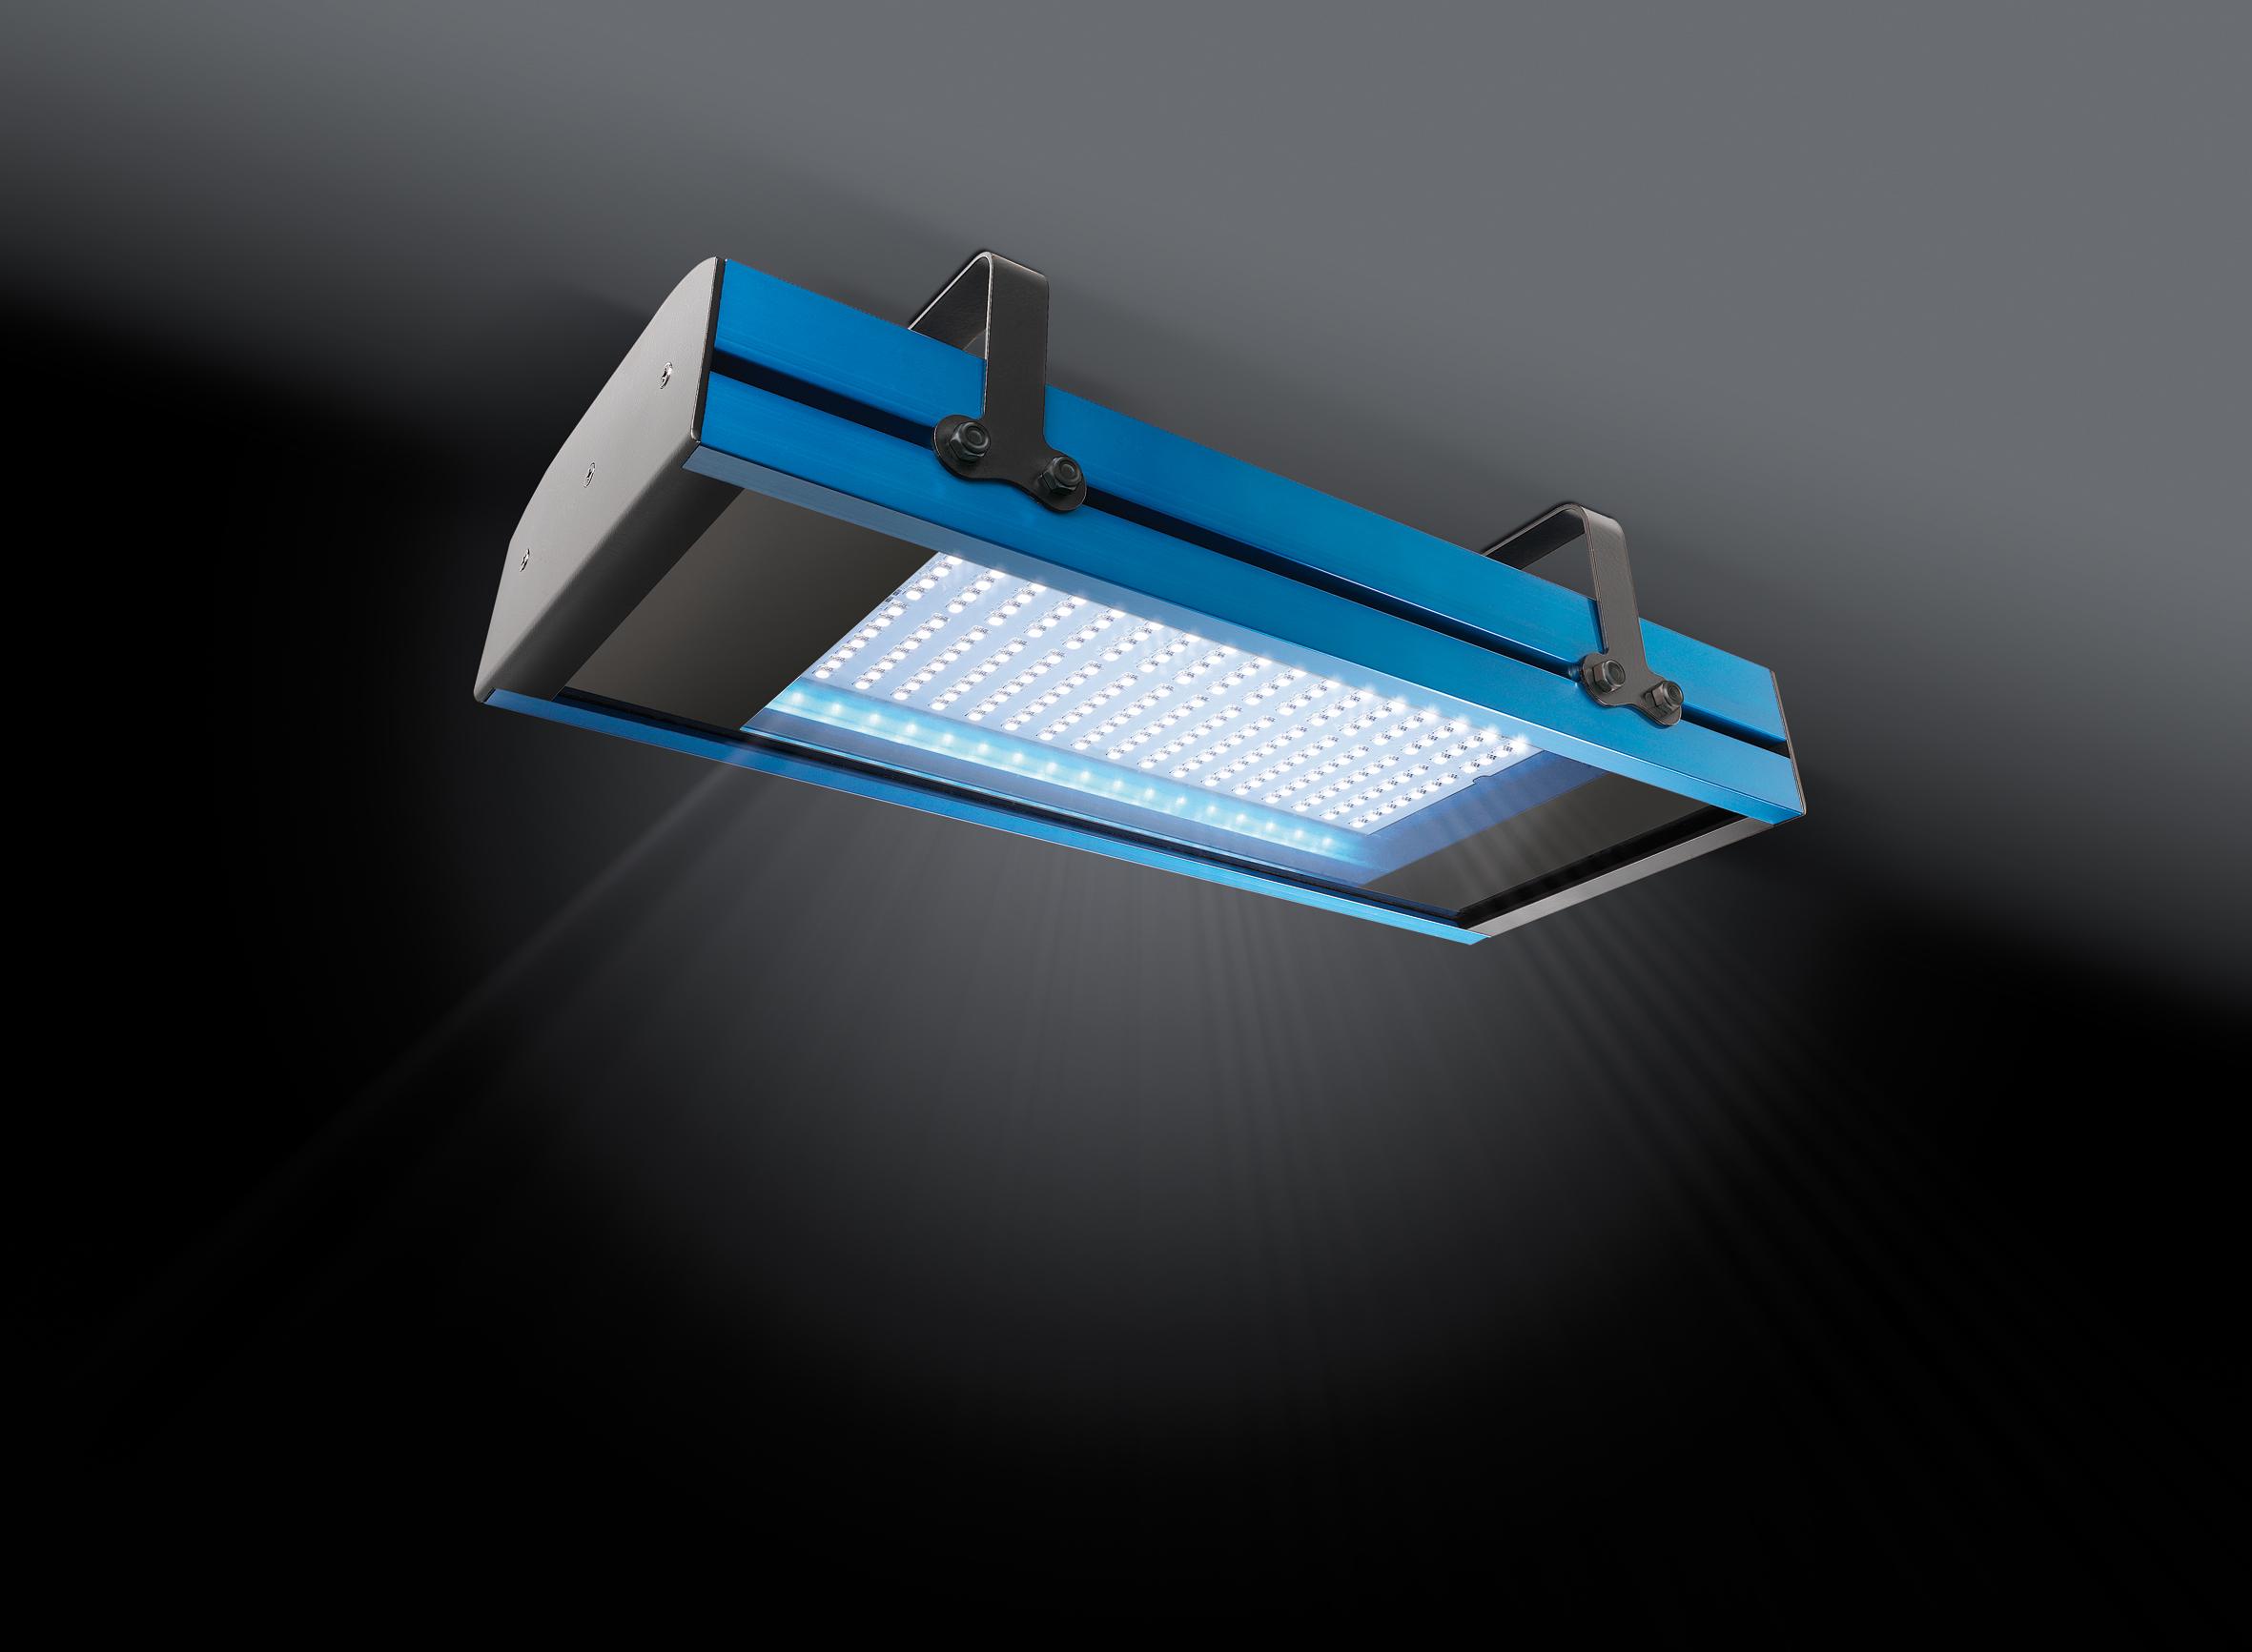 Lampade led design : Luce led per l'industria - e design